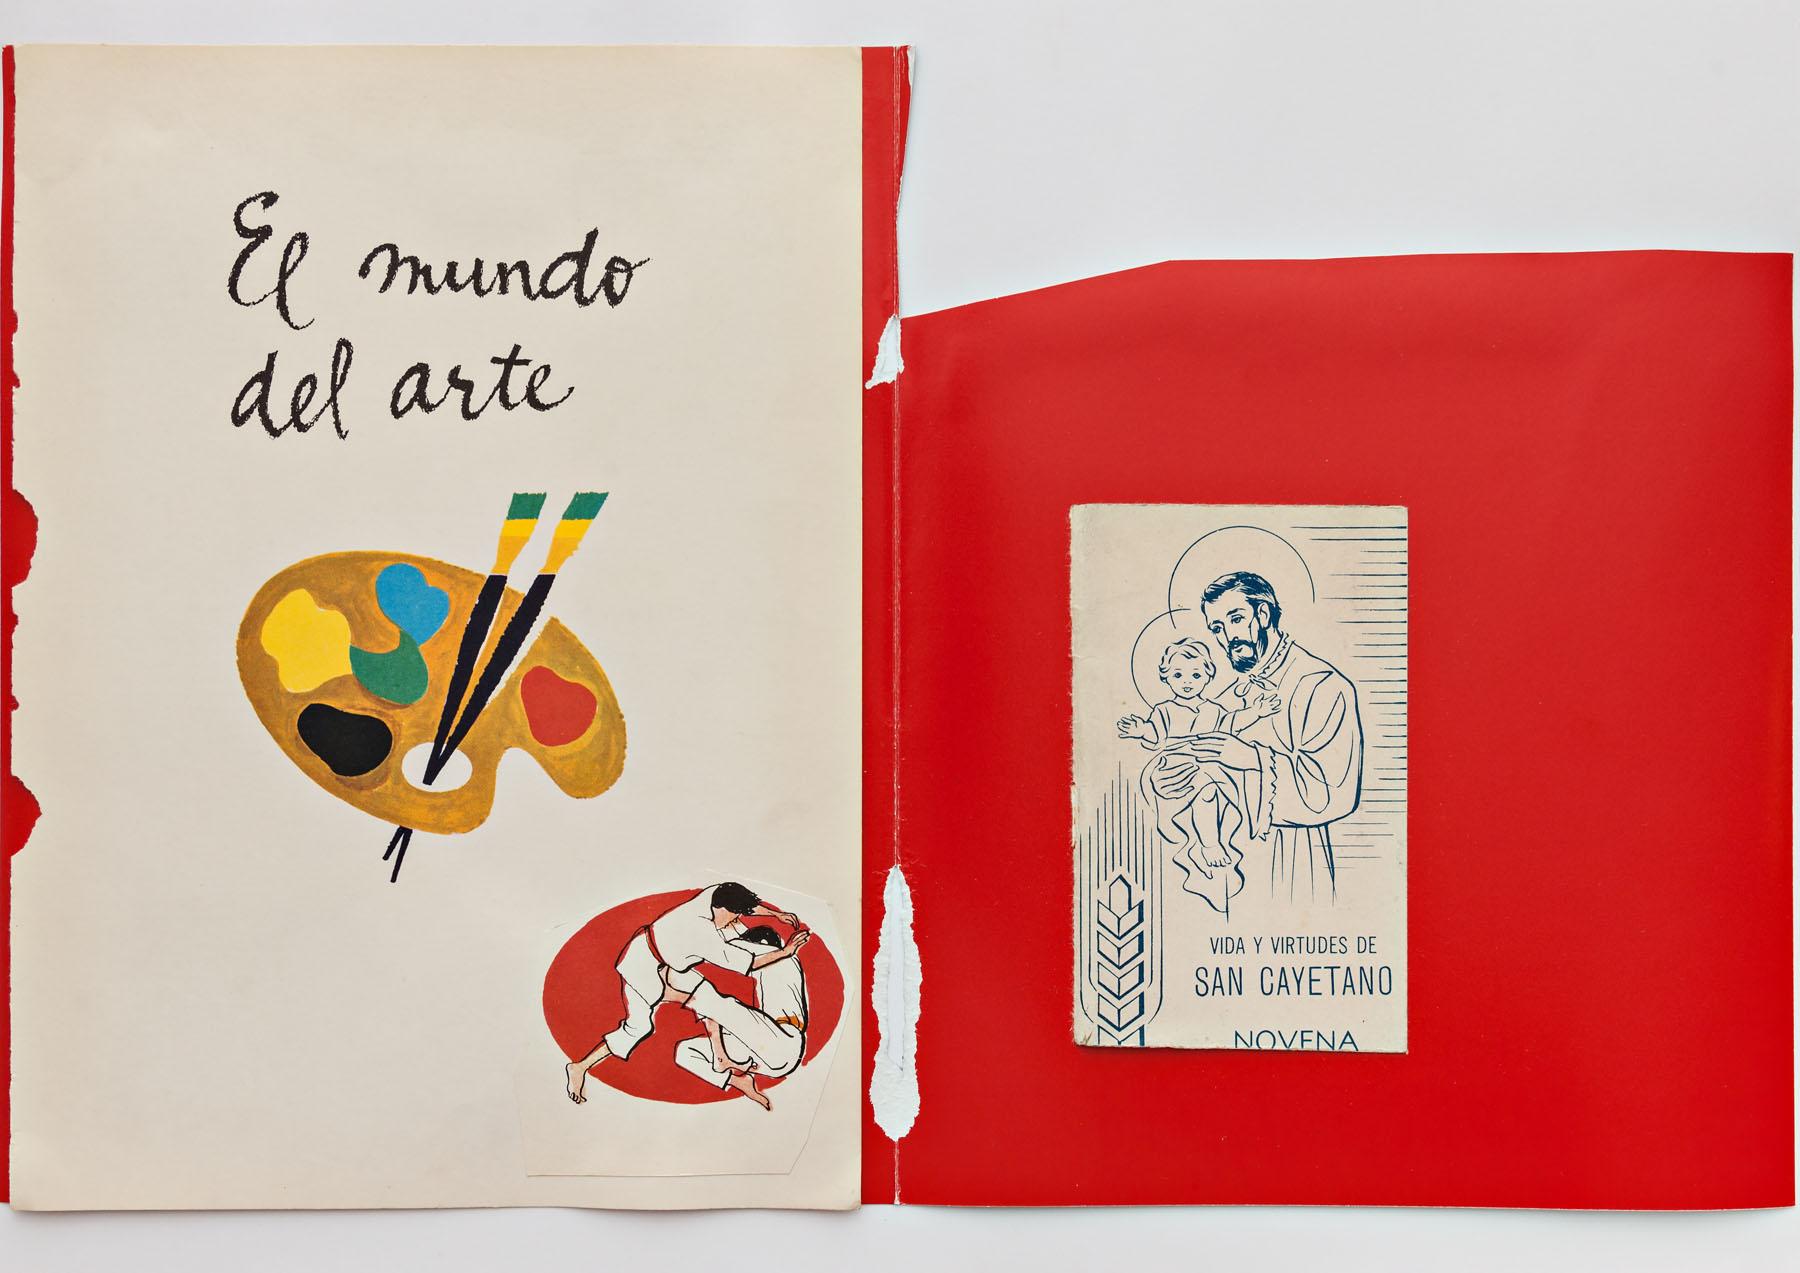 Serie Cuarentena, papel collage, 30 cm x 42 cm, 2020